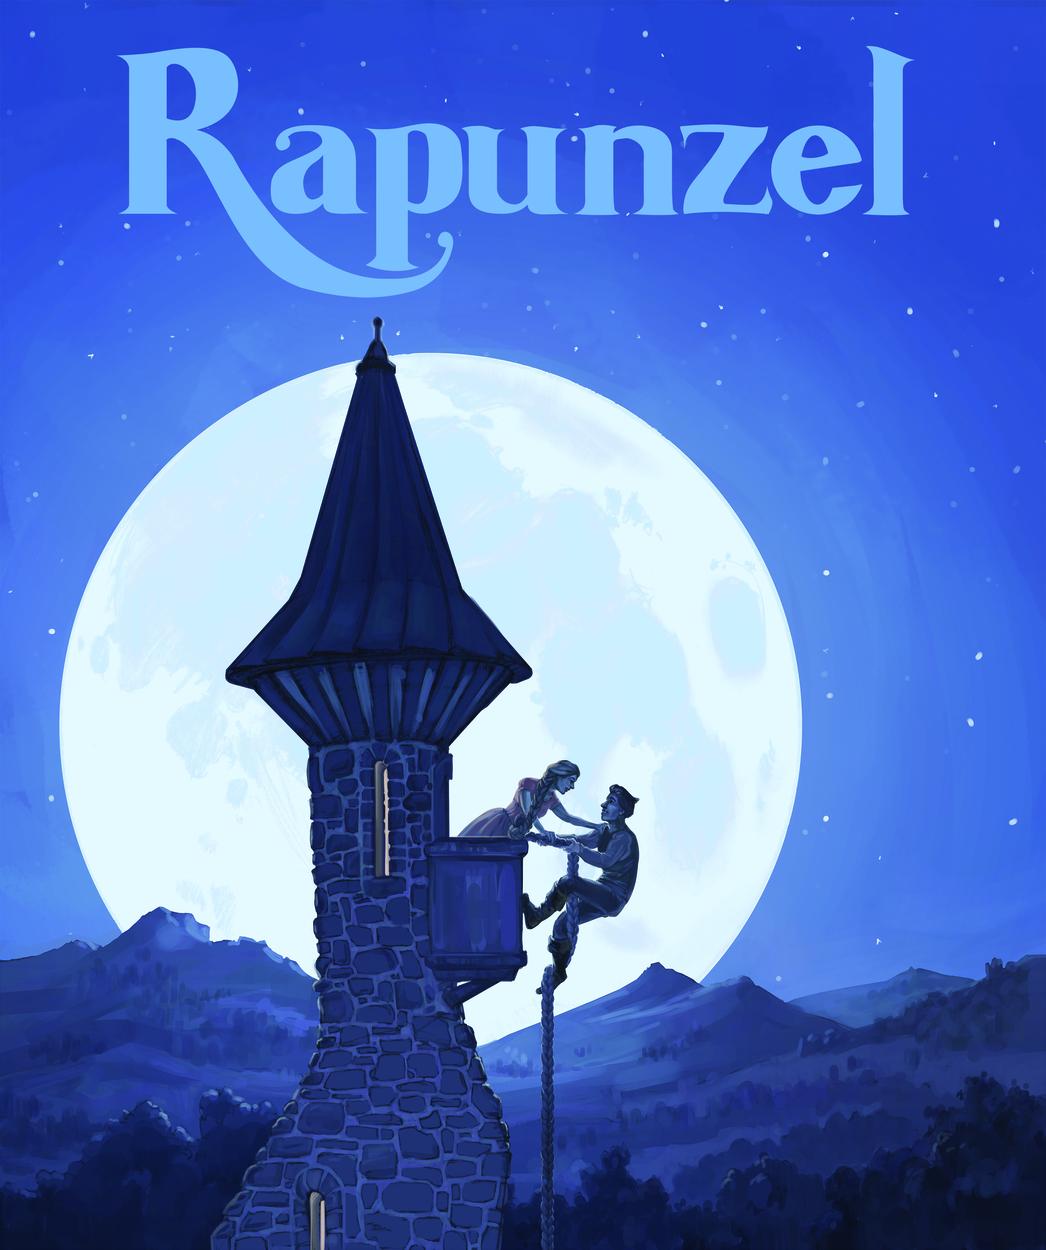 Rapunzel Artwork by Erika Steiskal